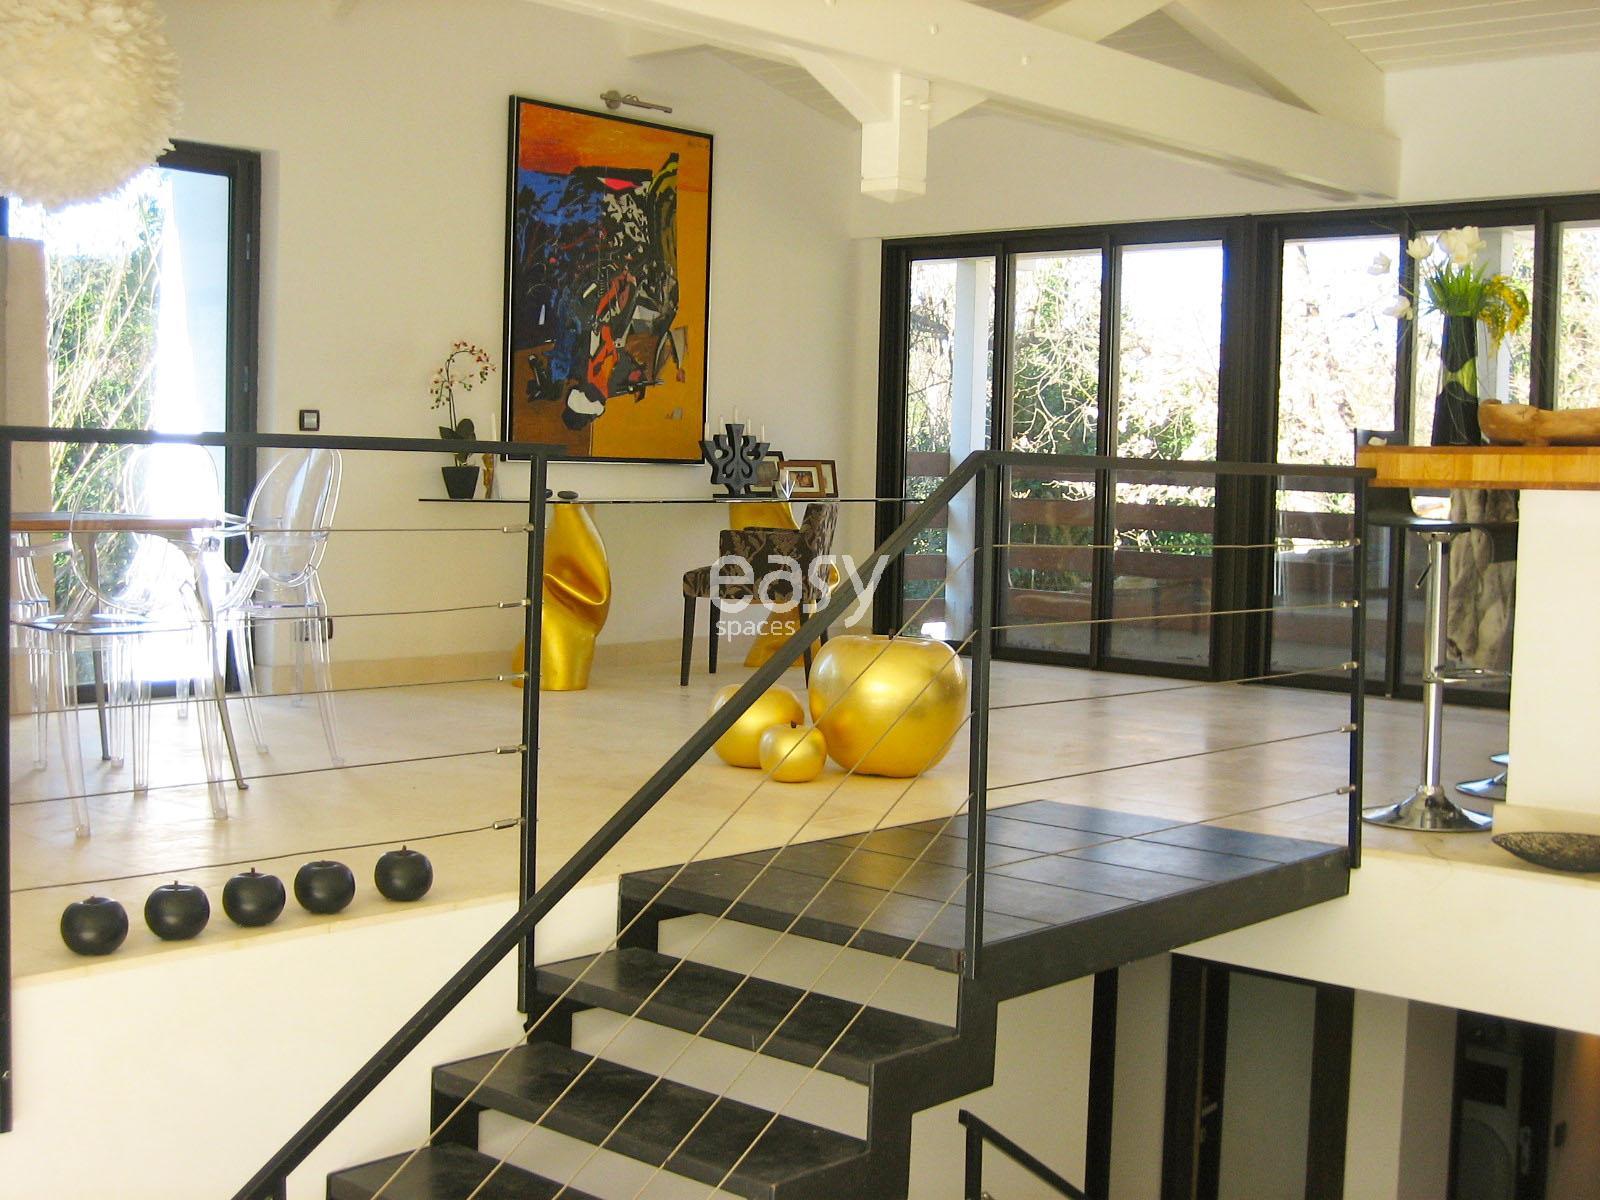 comment louer une maison awesome location maison with comment louer une maison perfect. Black Bedroom Furniture Sets. Home Design Ideas